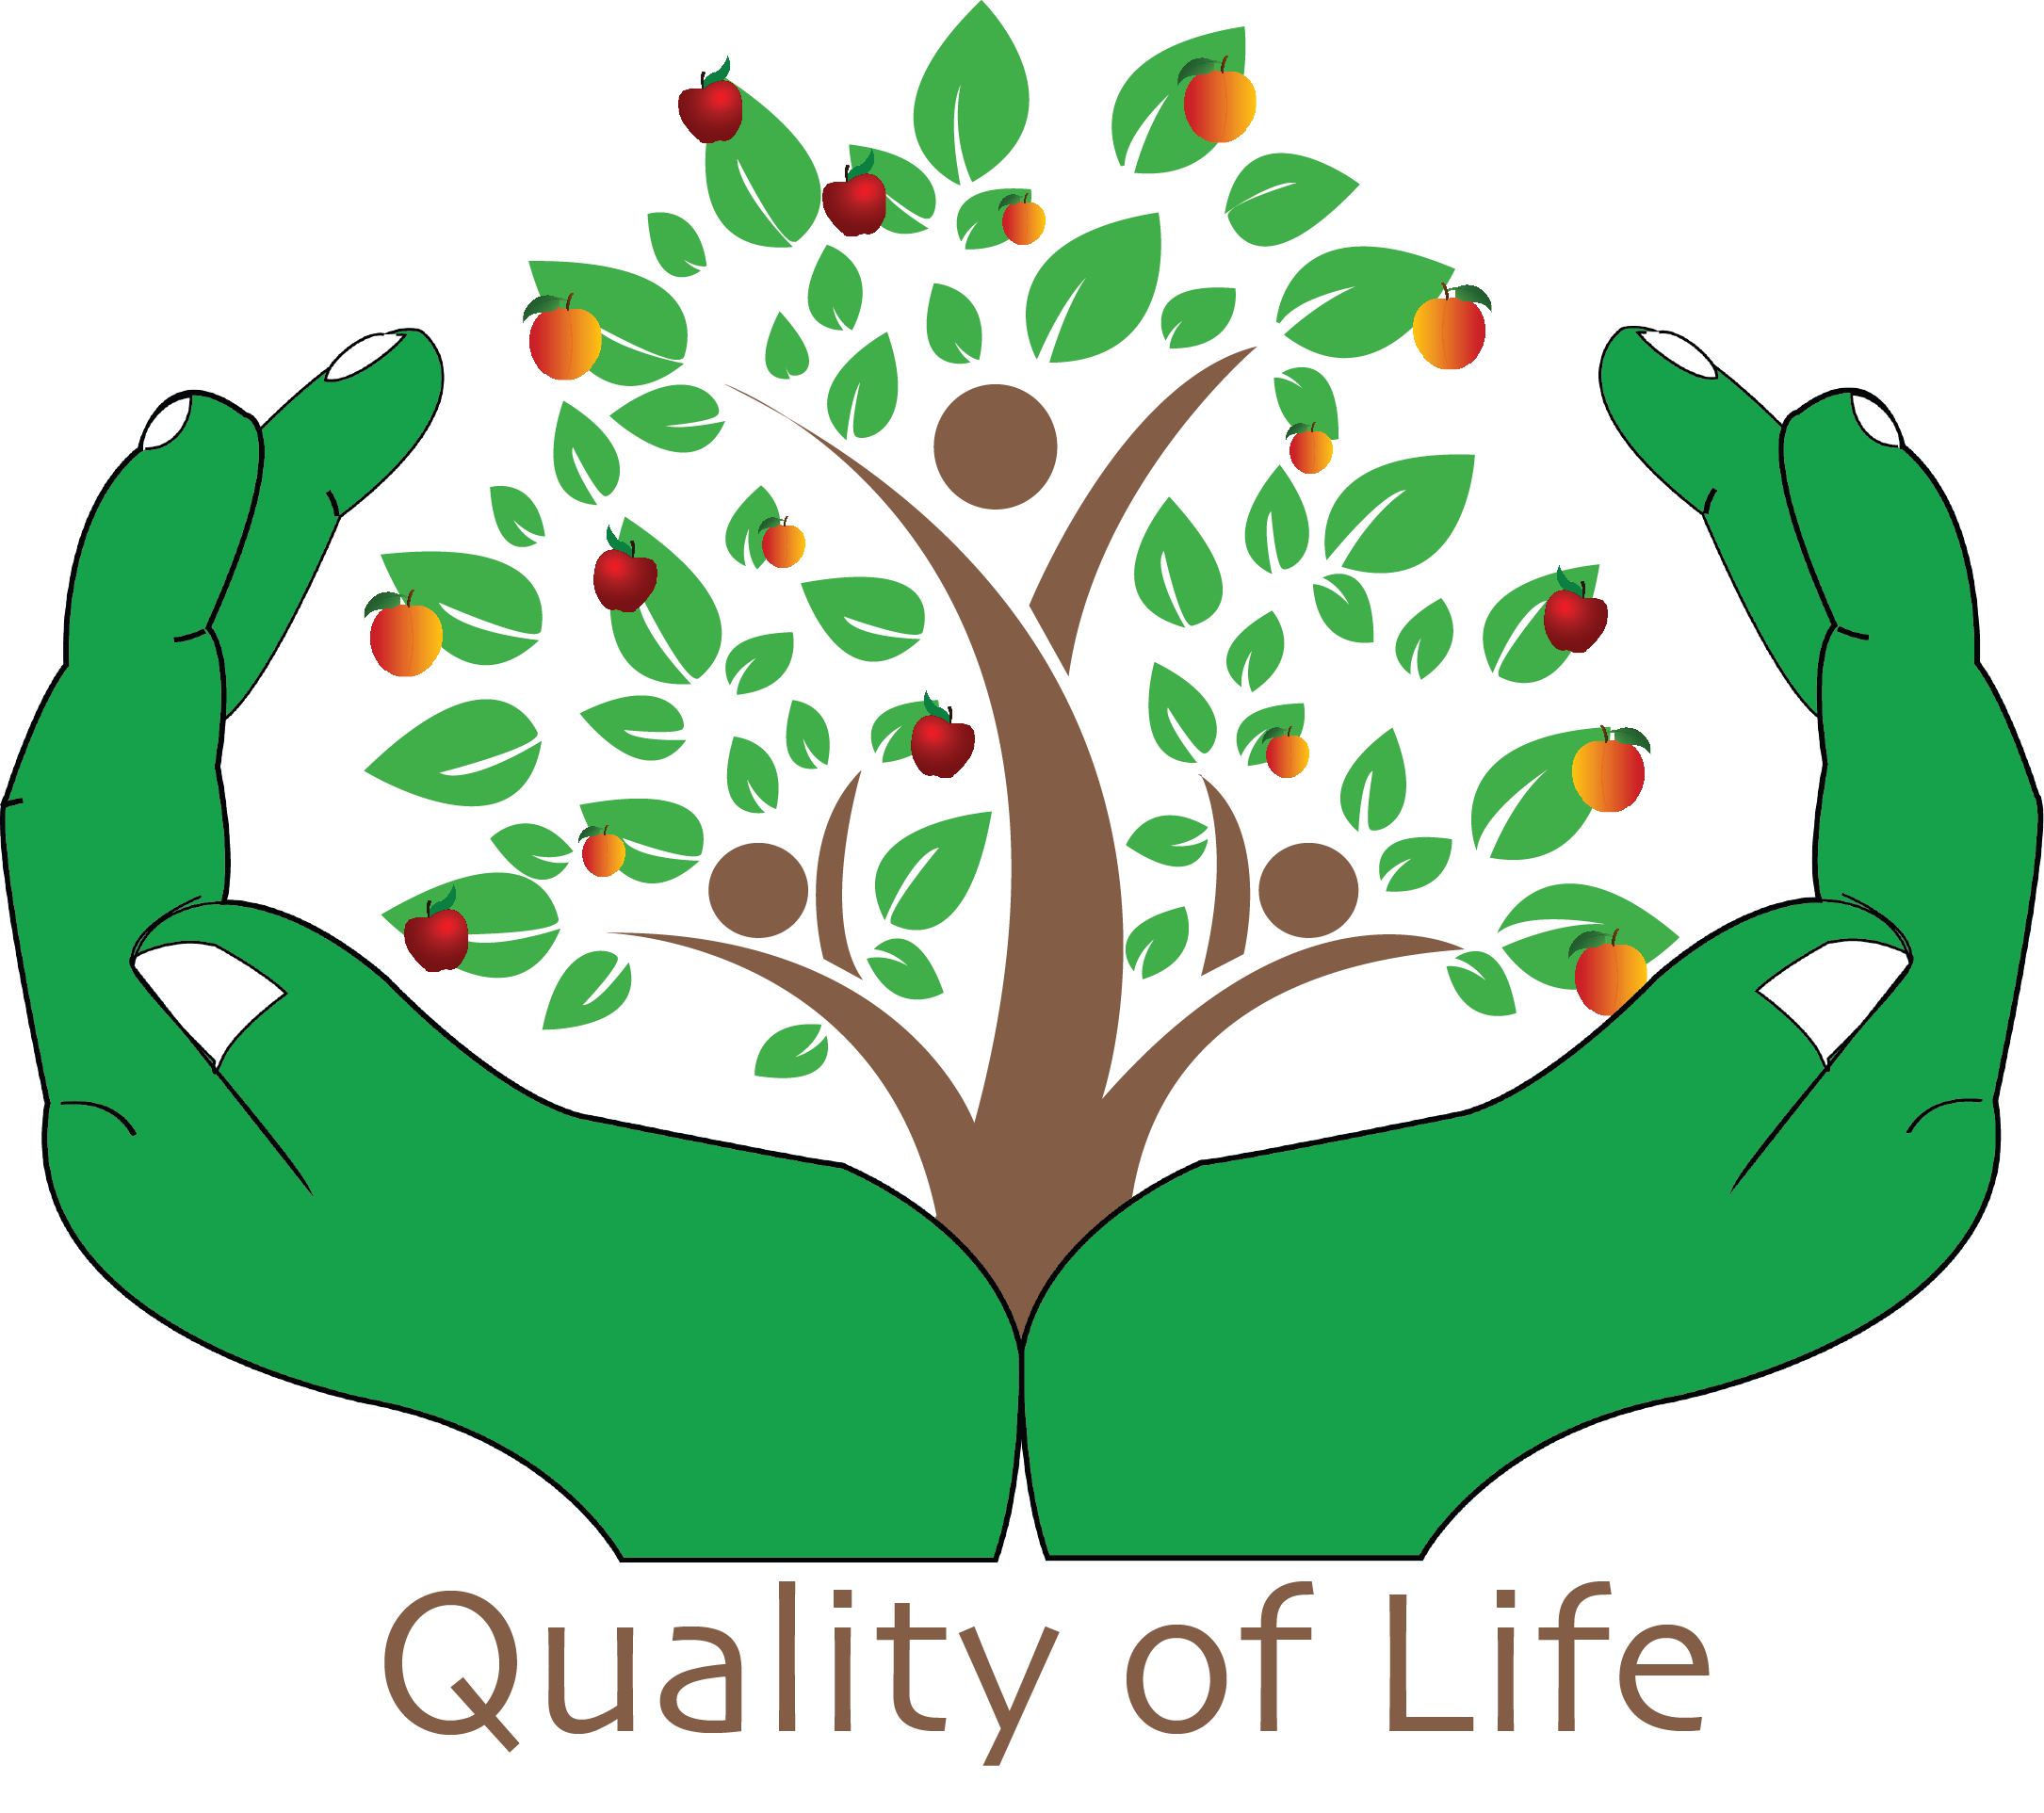 Life quality life